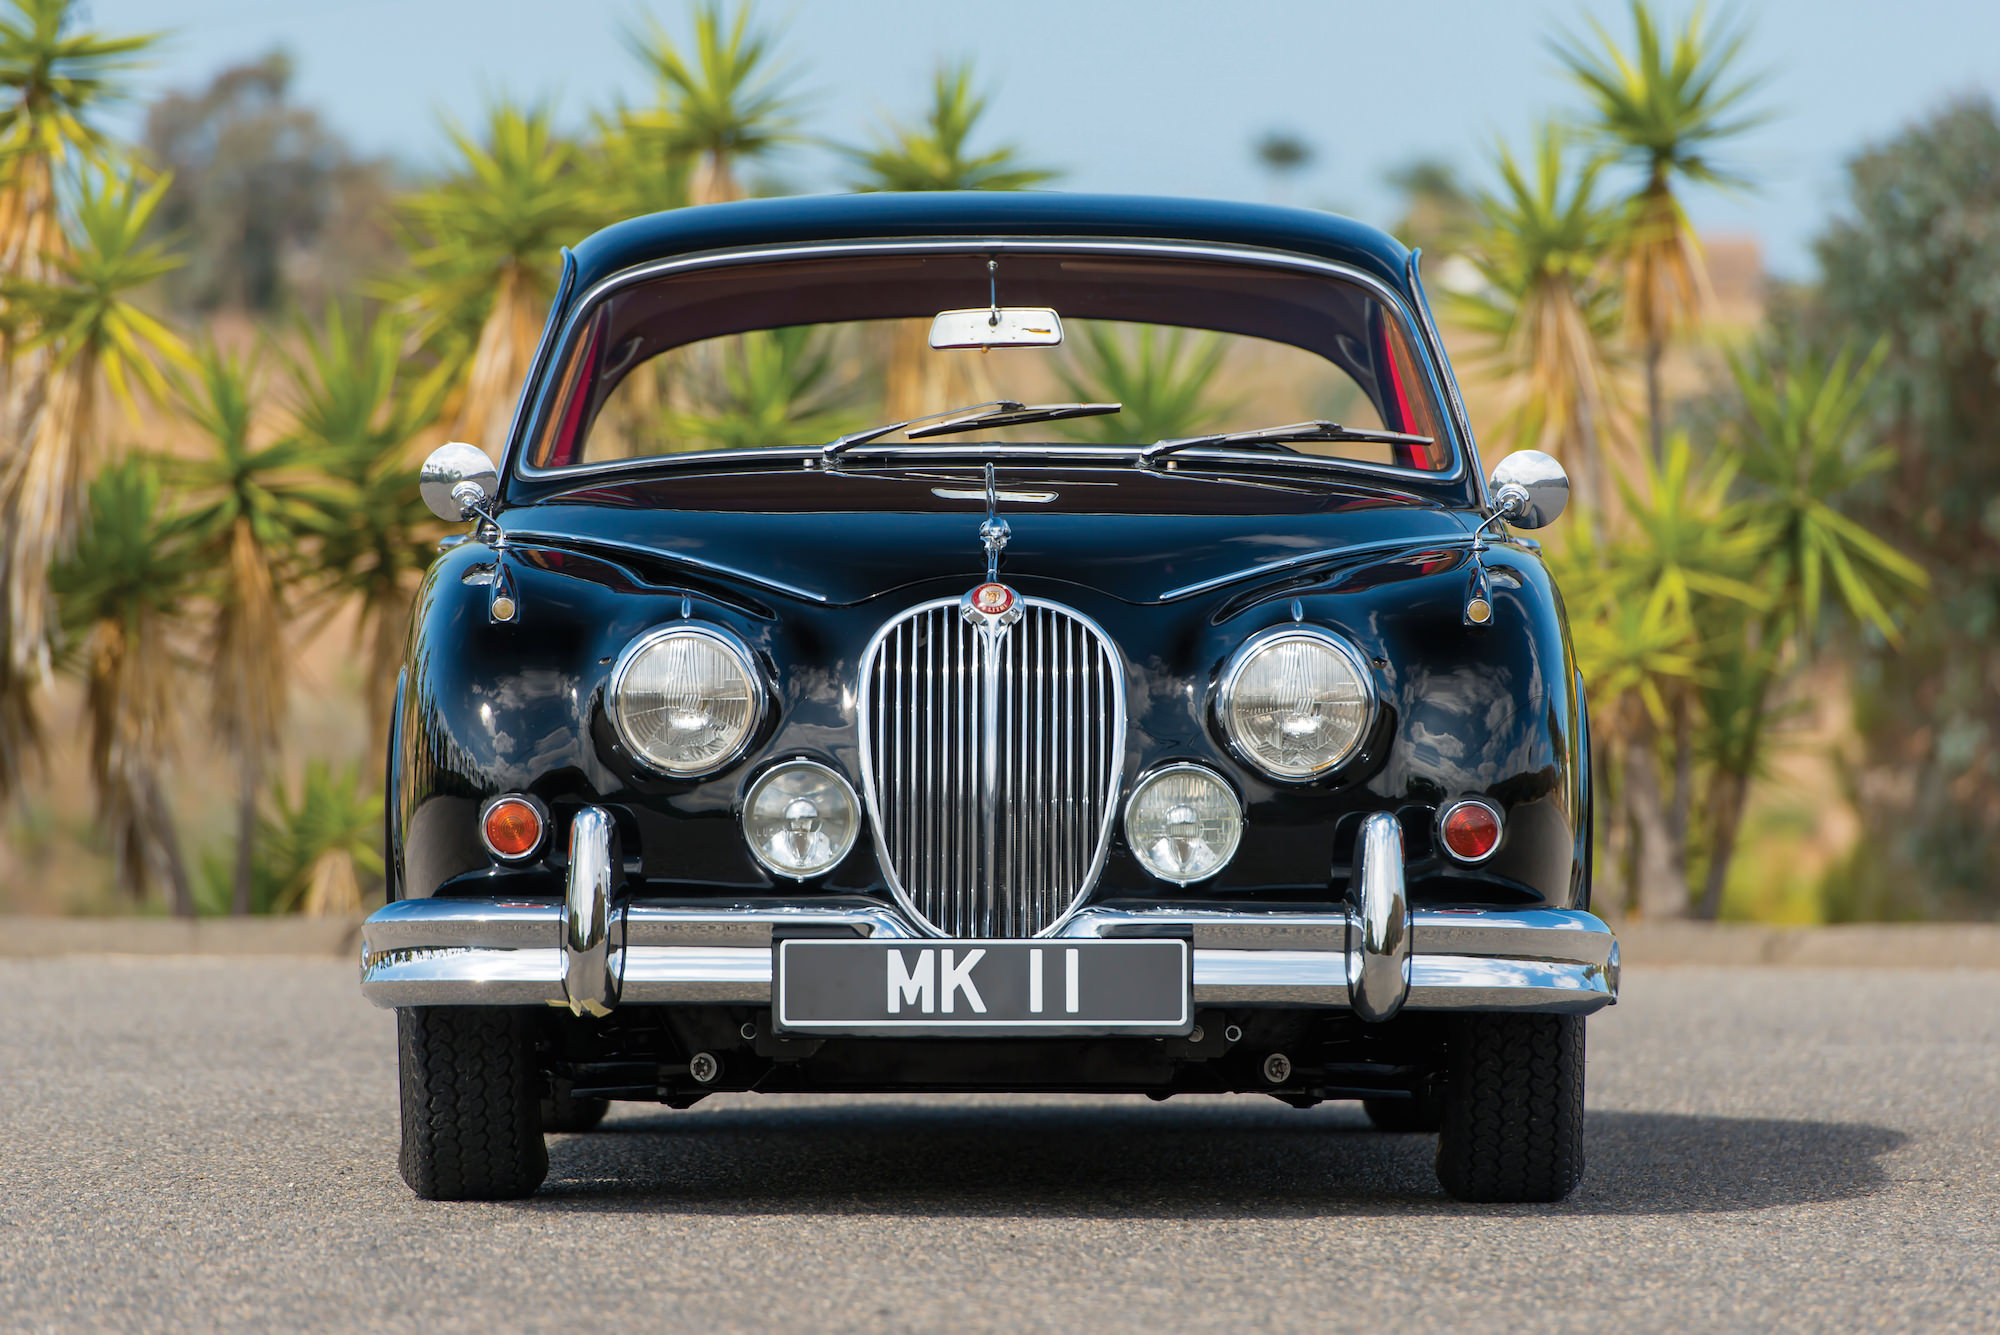 The Fastest Car In The World 2015 >> Jaguar Mark II - The Original Gentleman's Getaway Car